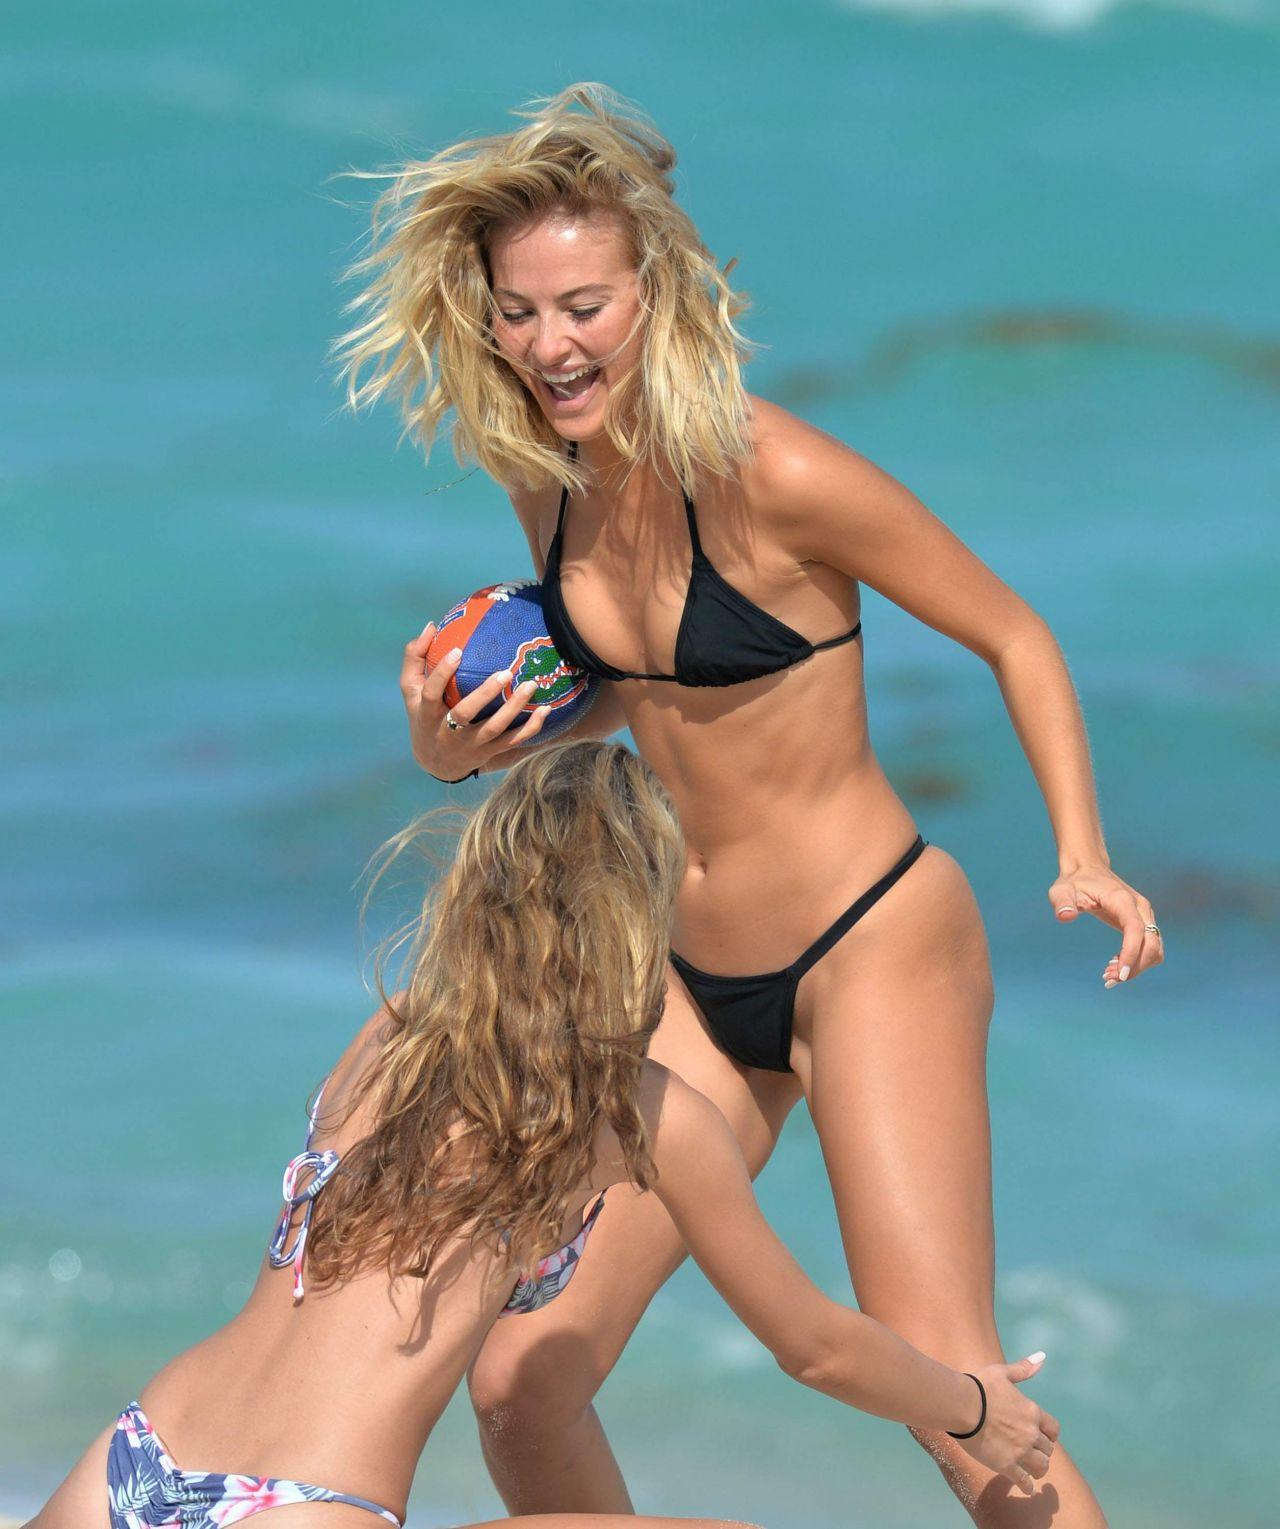 Selena Weber Bikini Photos Beach Miami February 11 Lucy Boynton